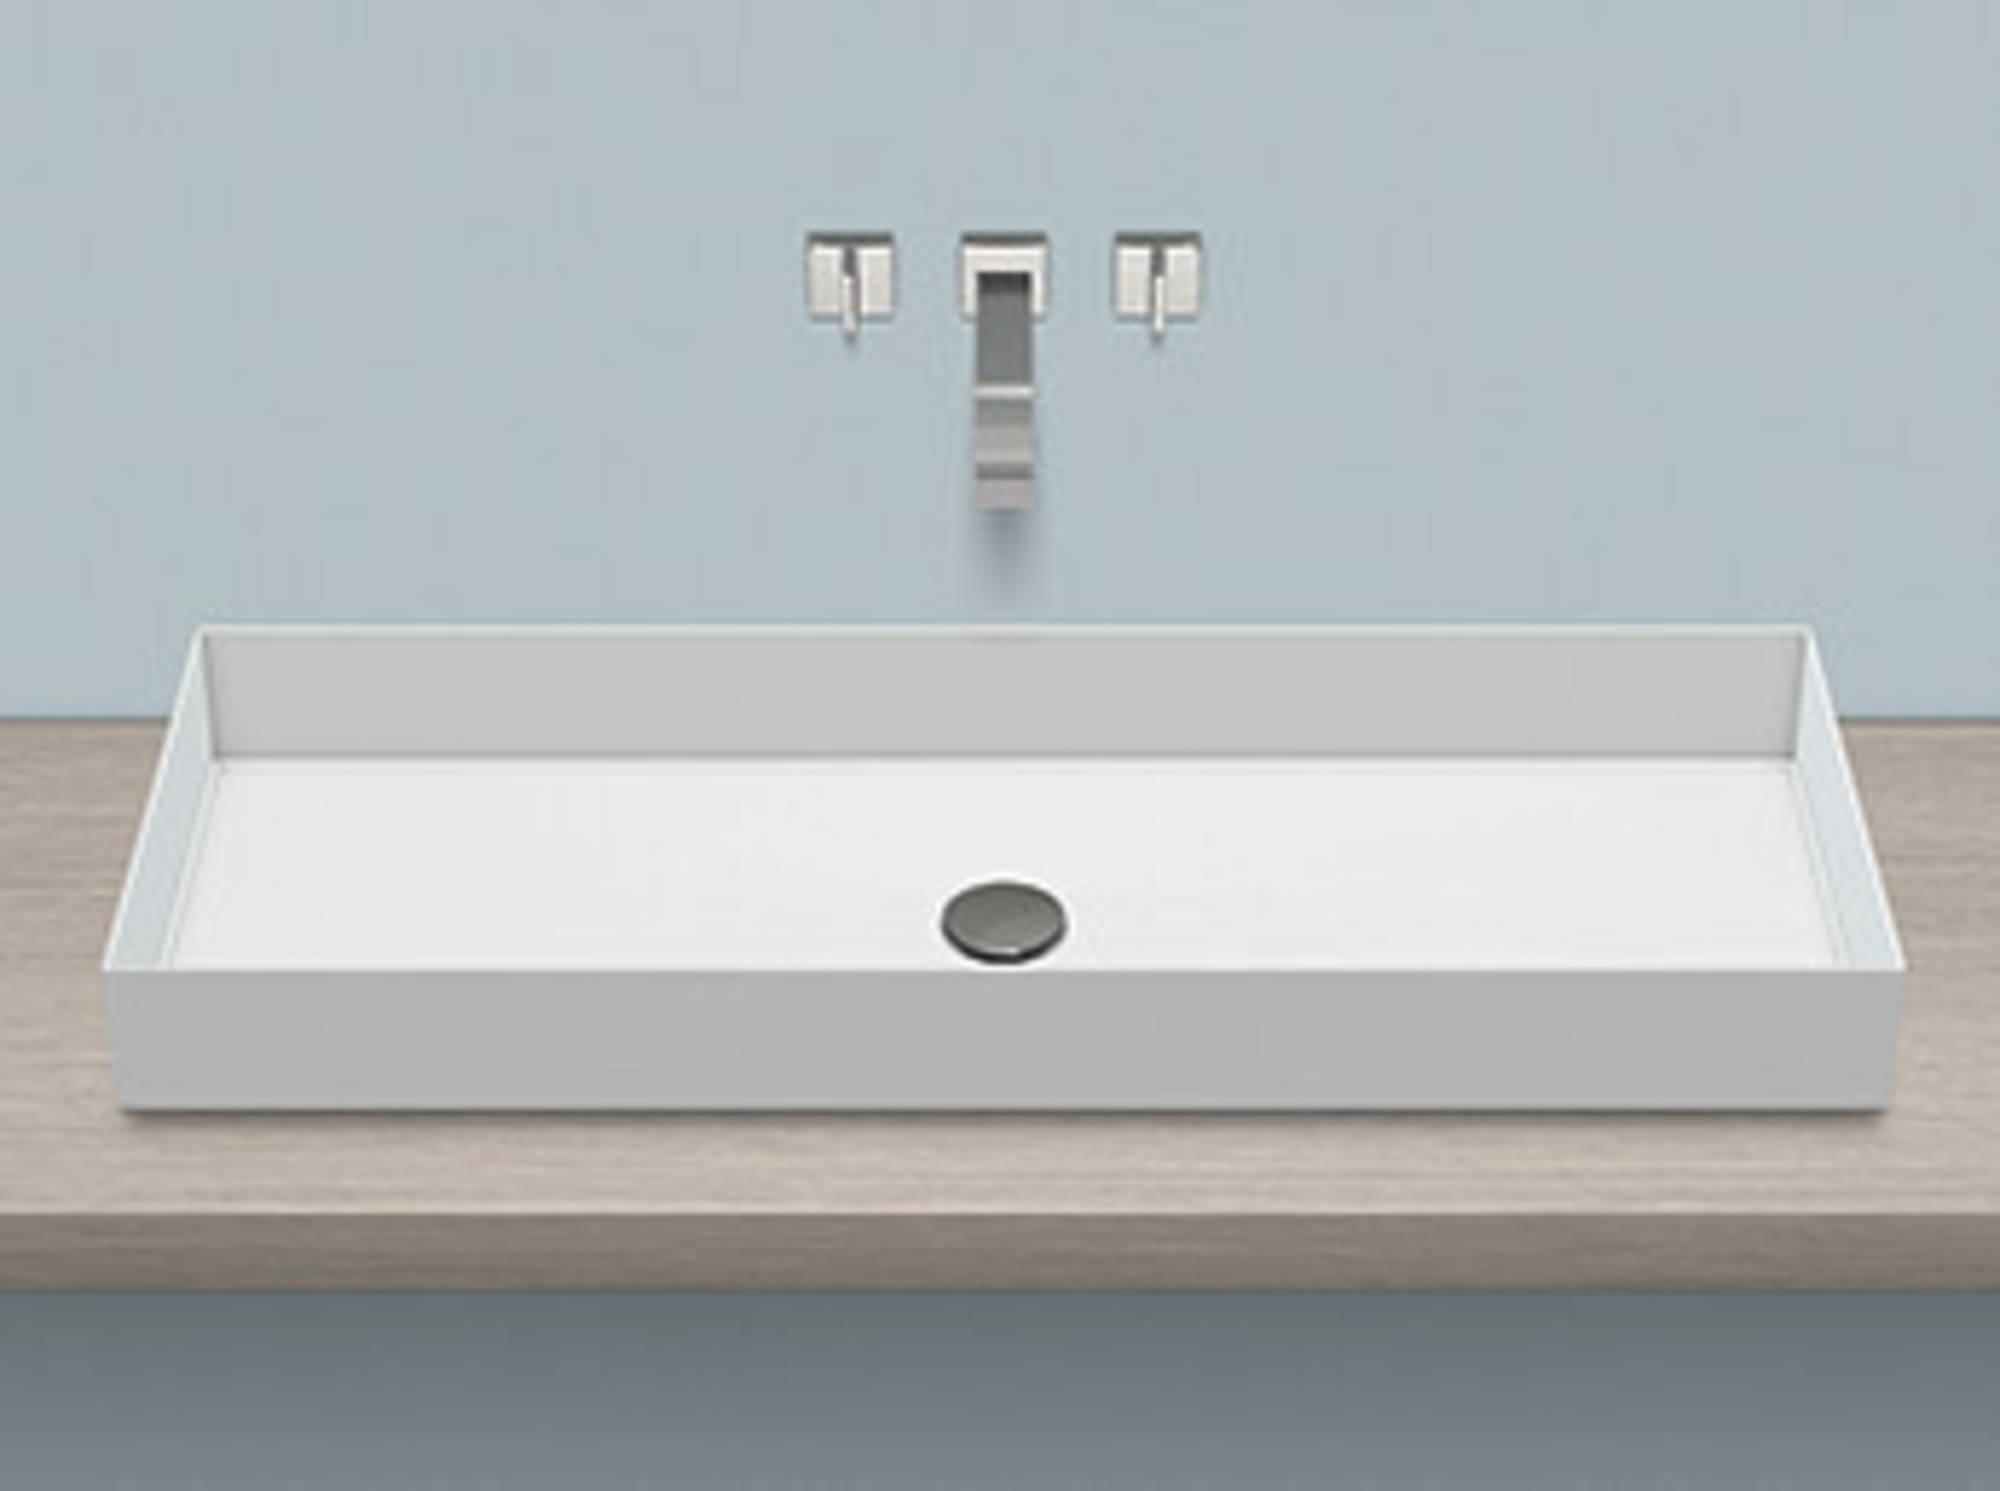 Alape Metaphor AB.ME1000 opbouwwaskom 100x37.5x11cm Clean z. kraangat z. overloop incl. plug wit